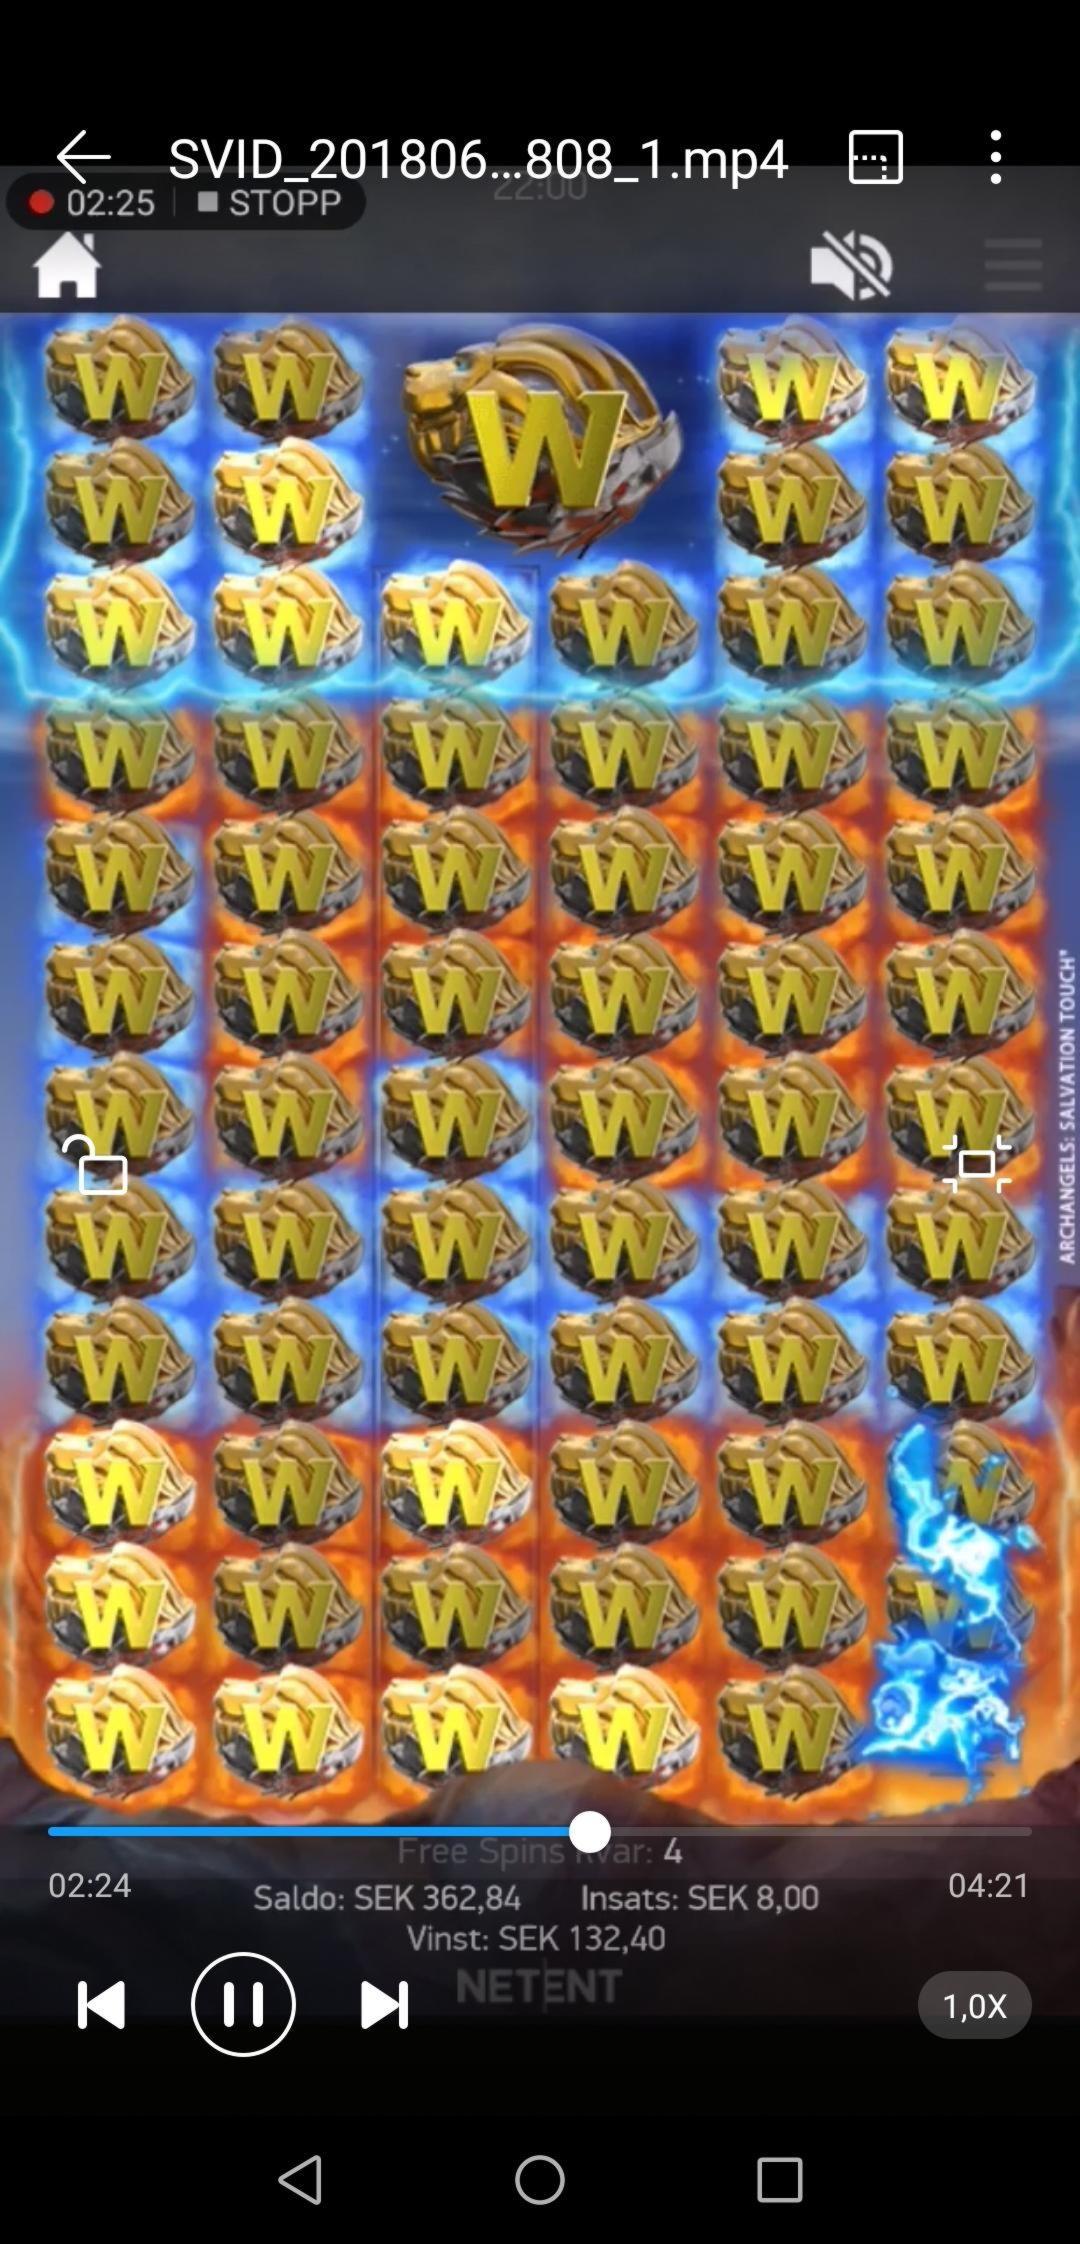 EURO 520 Casino Tournament في دريم فيجاس